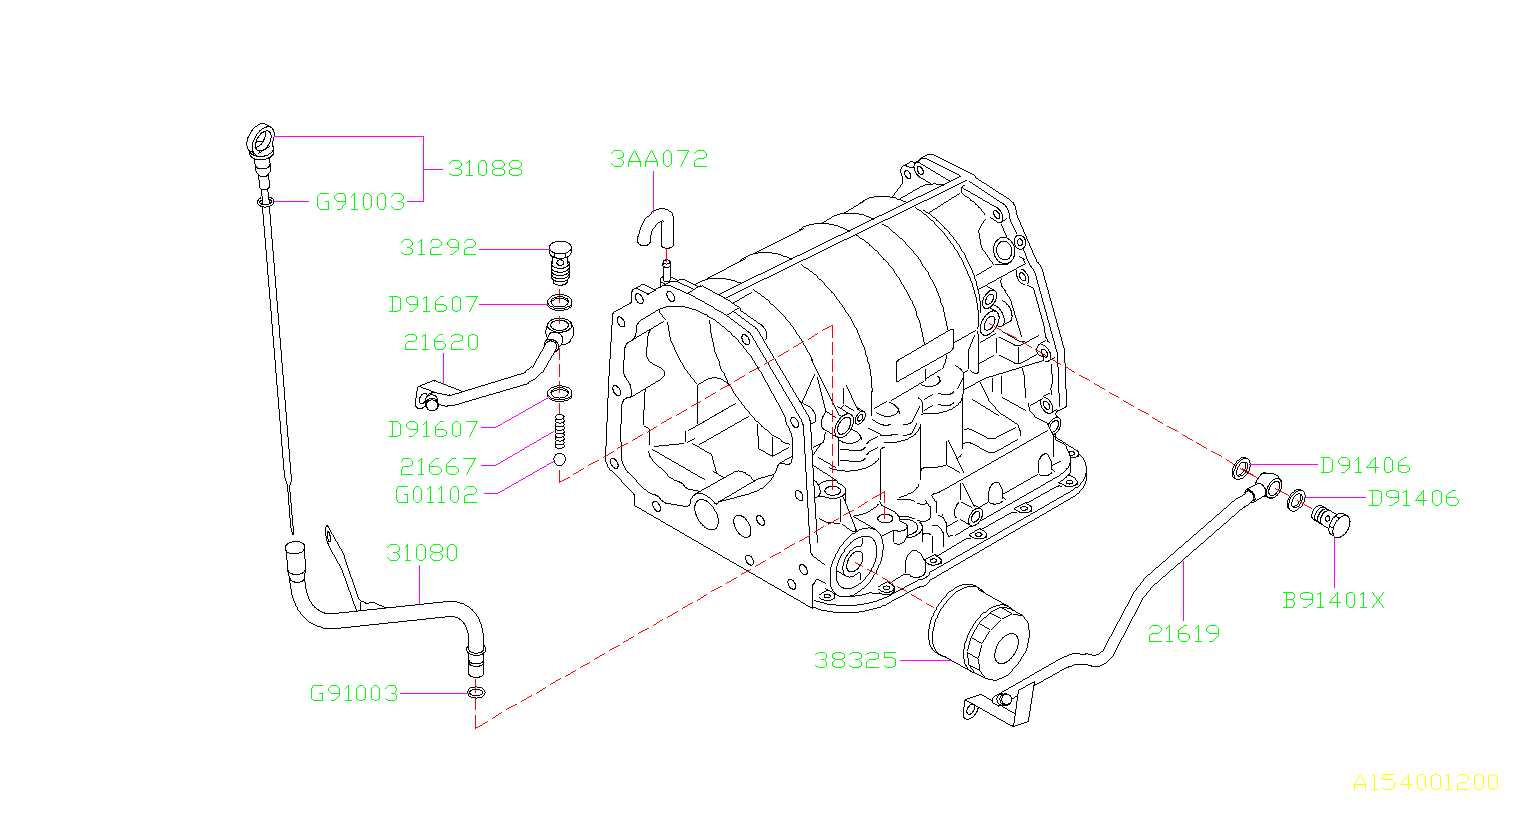 2006 Subaru Forester Auto transmission fluid filter